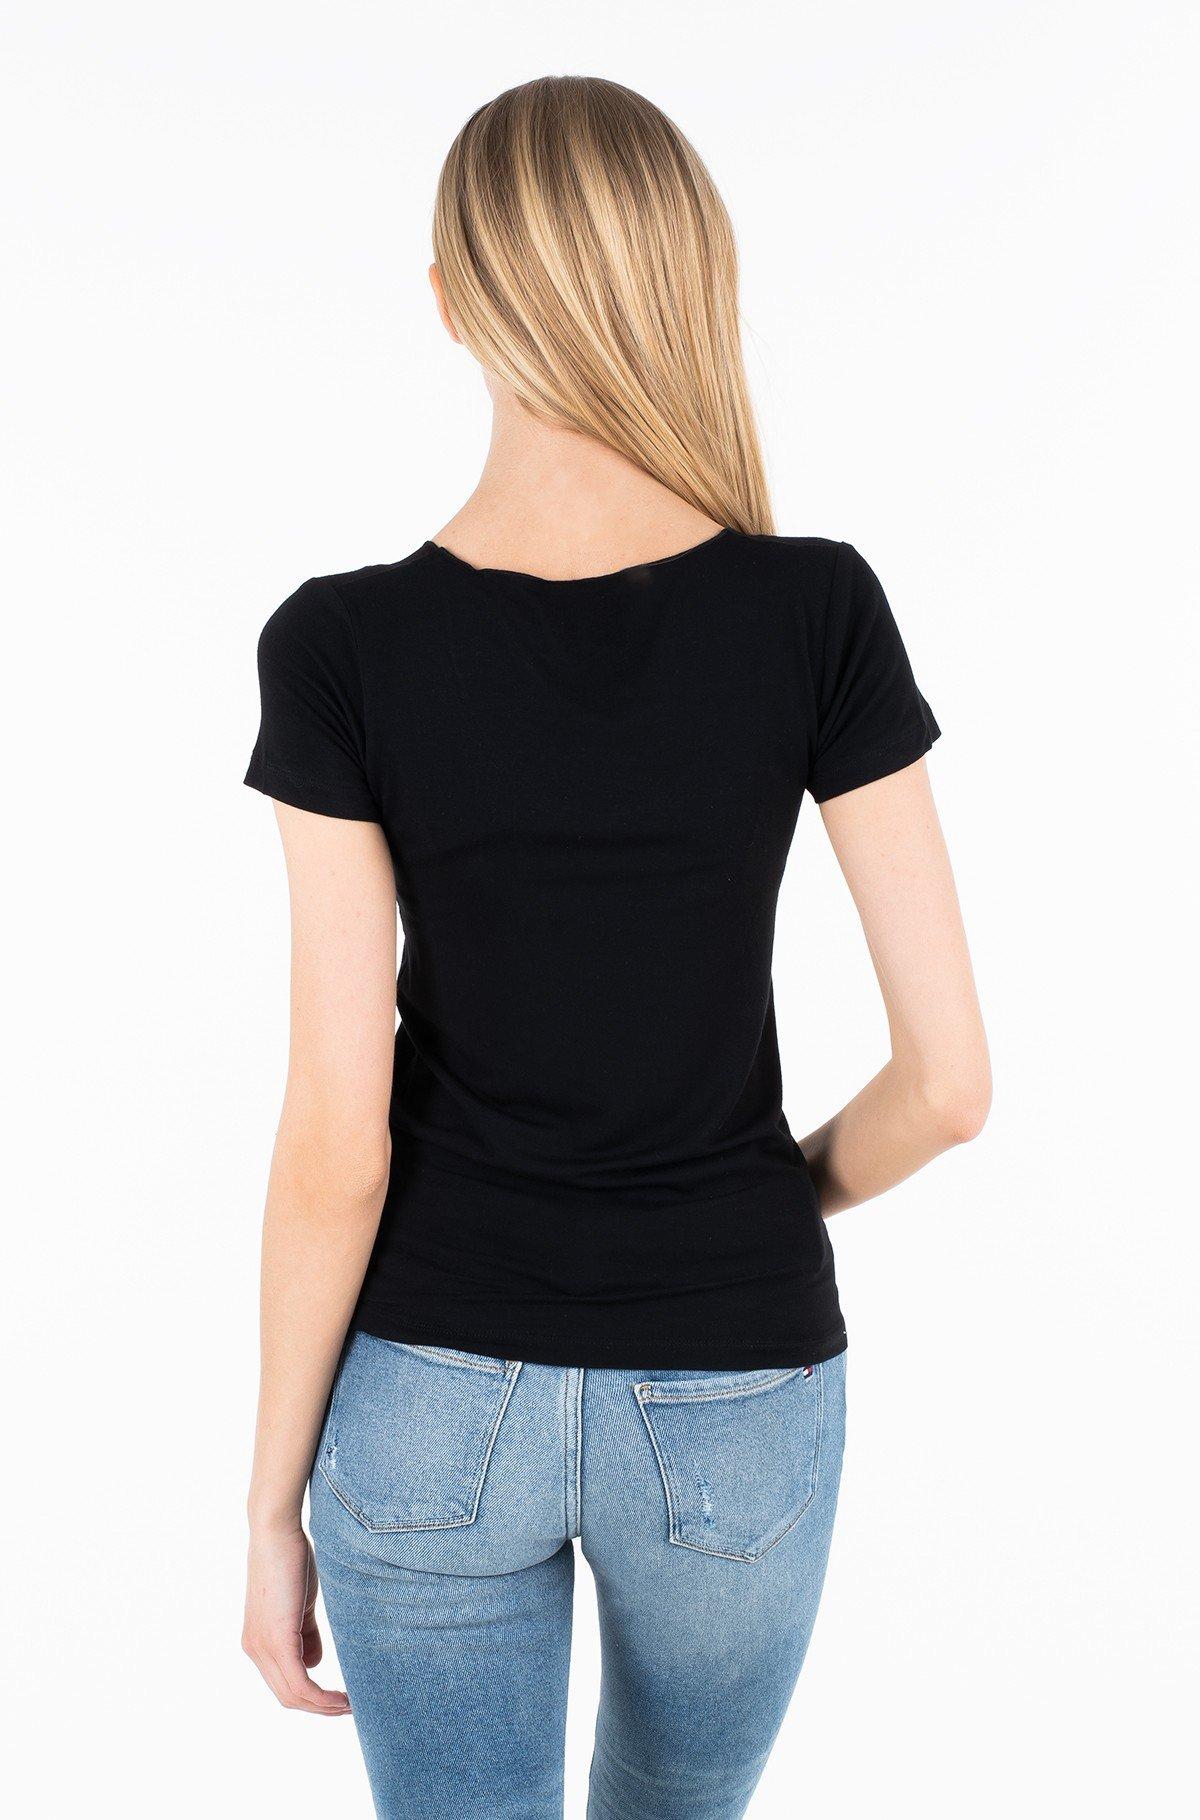 Marškinėliai DONNA/PL504053-full-2